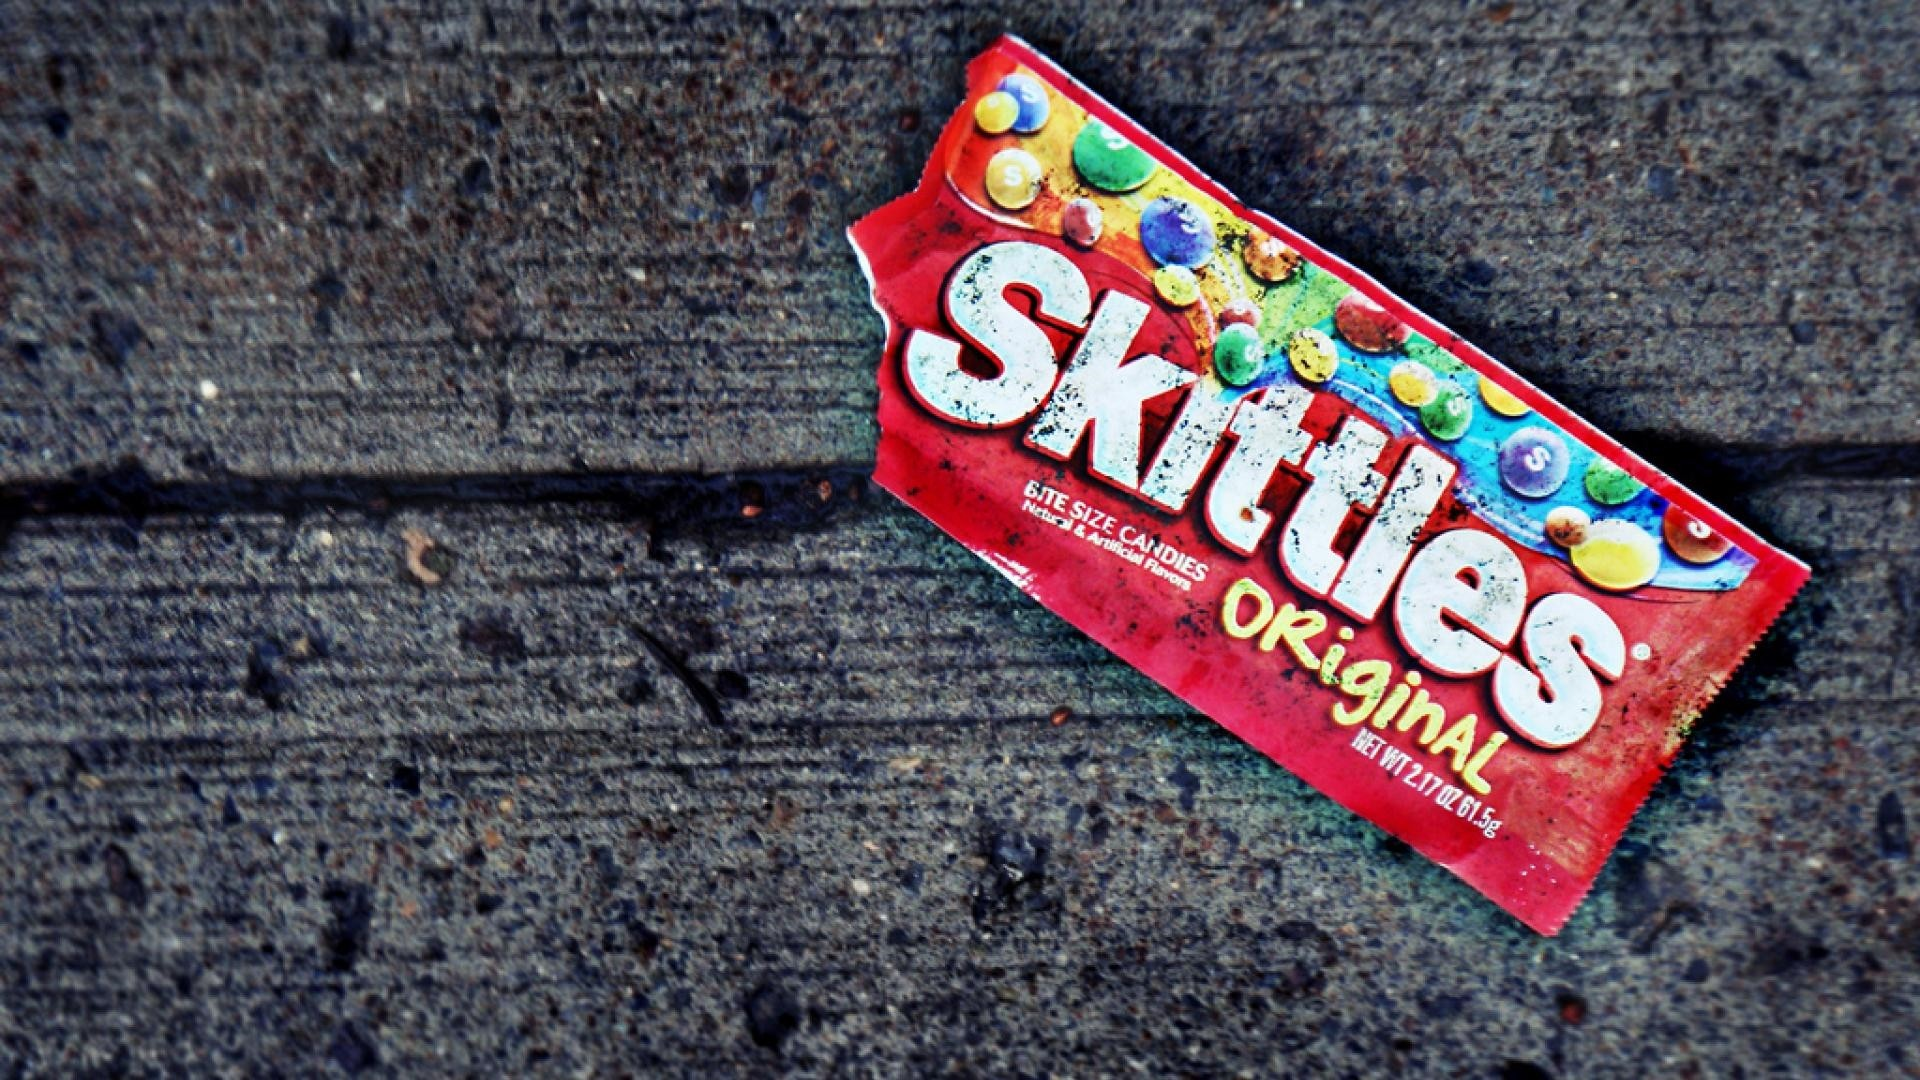 Skittles hd wallpaper